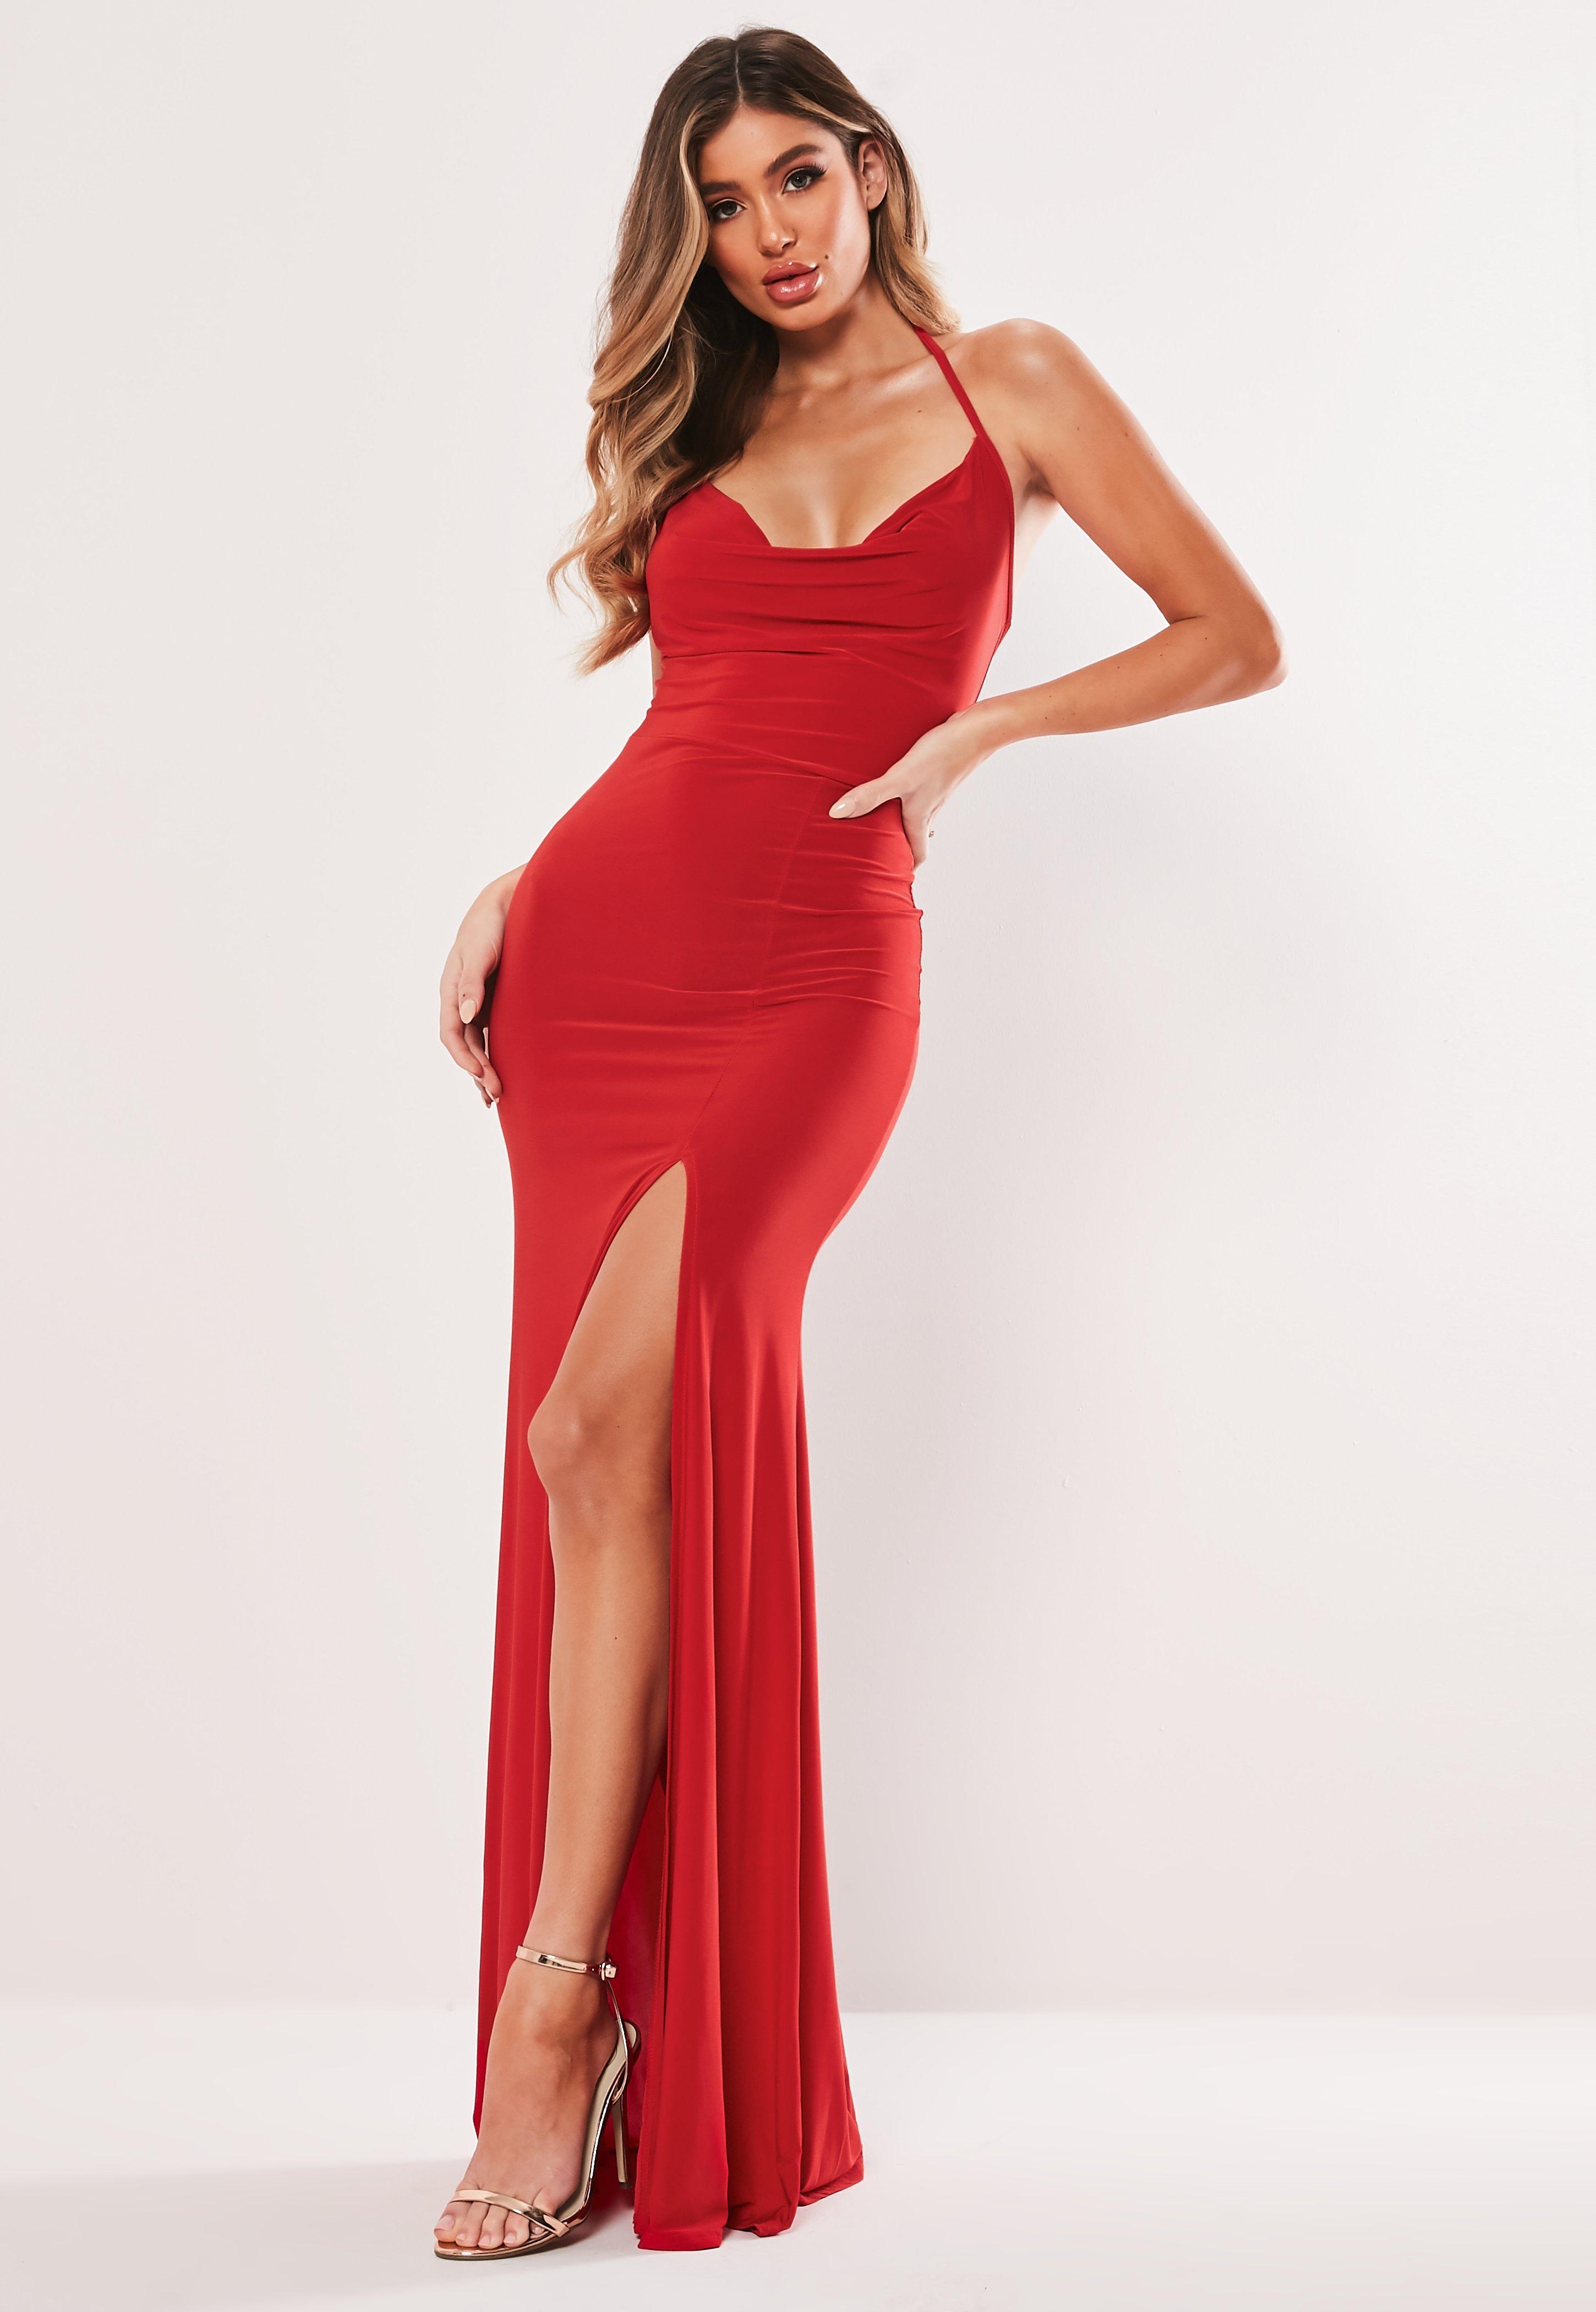 bca69358a0e0 Prom Dresses | Red Prom Dresses UK | Formal Dresses | Missguided